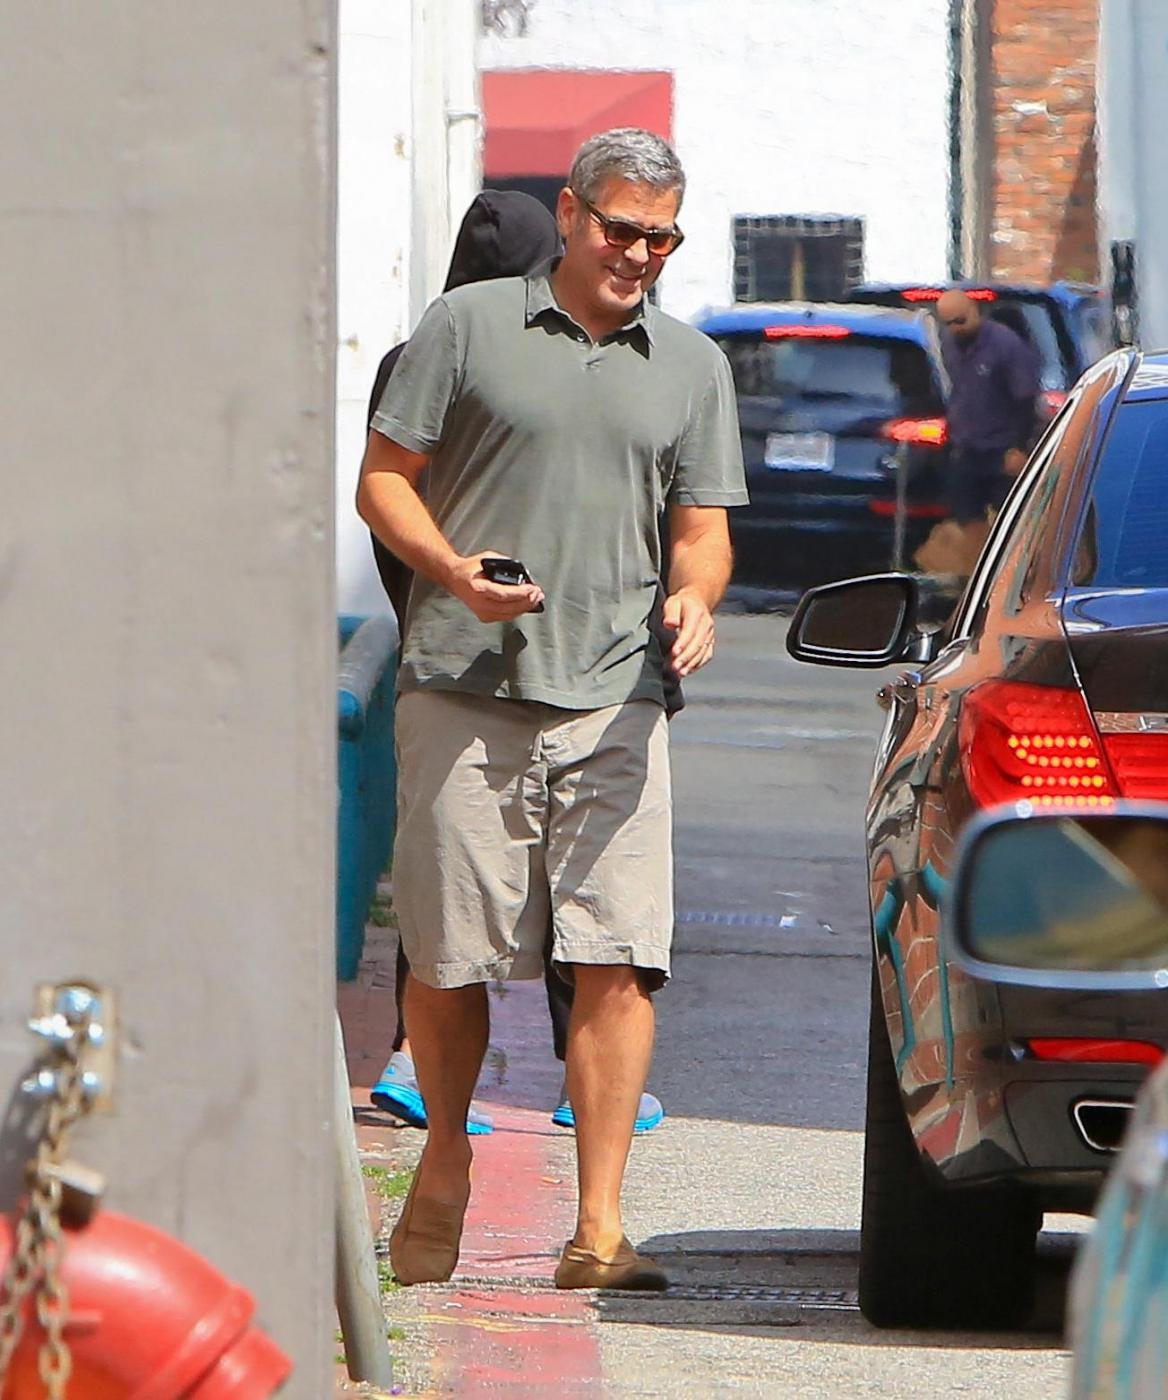 George Clooney, pantaloni corti e mocassini in giro per Beverly Hills FOTO 6